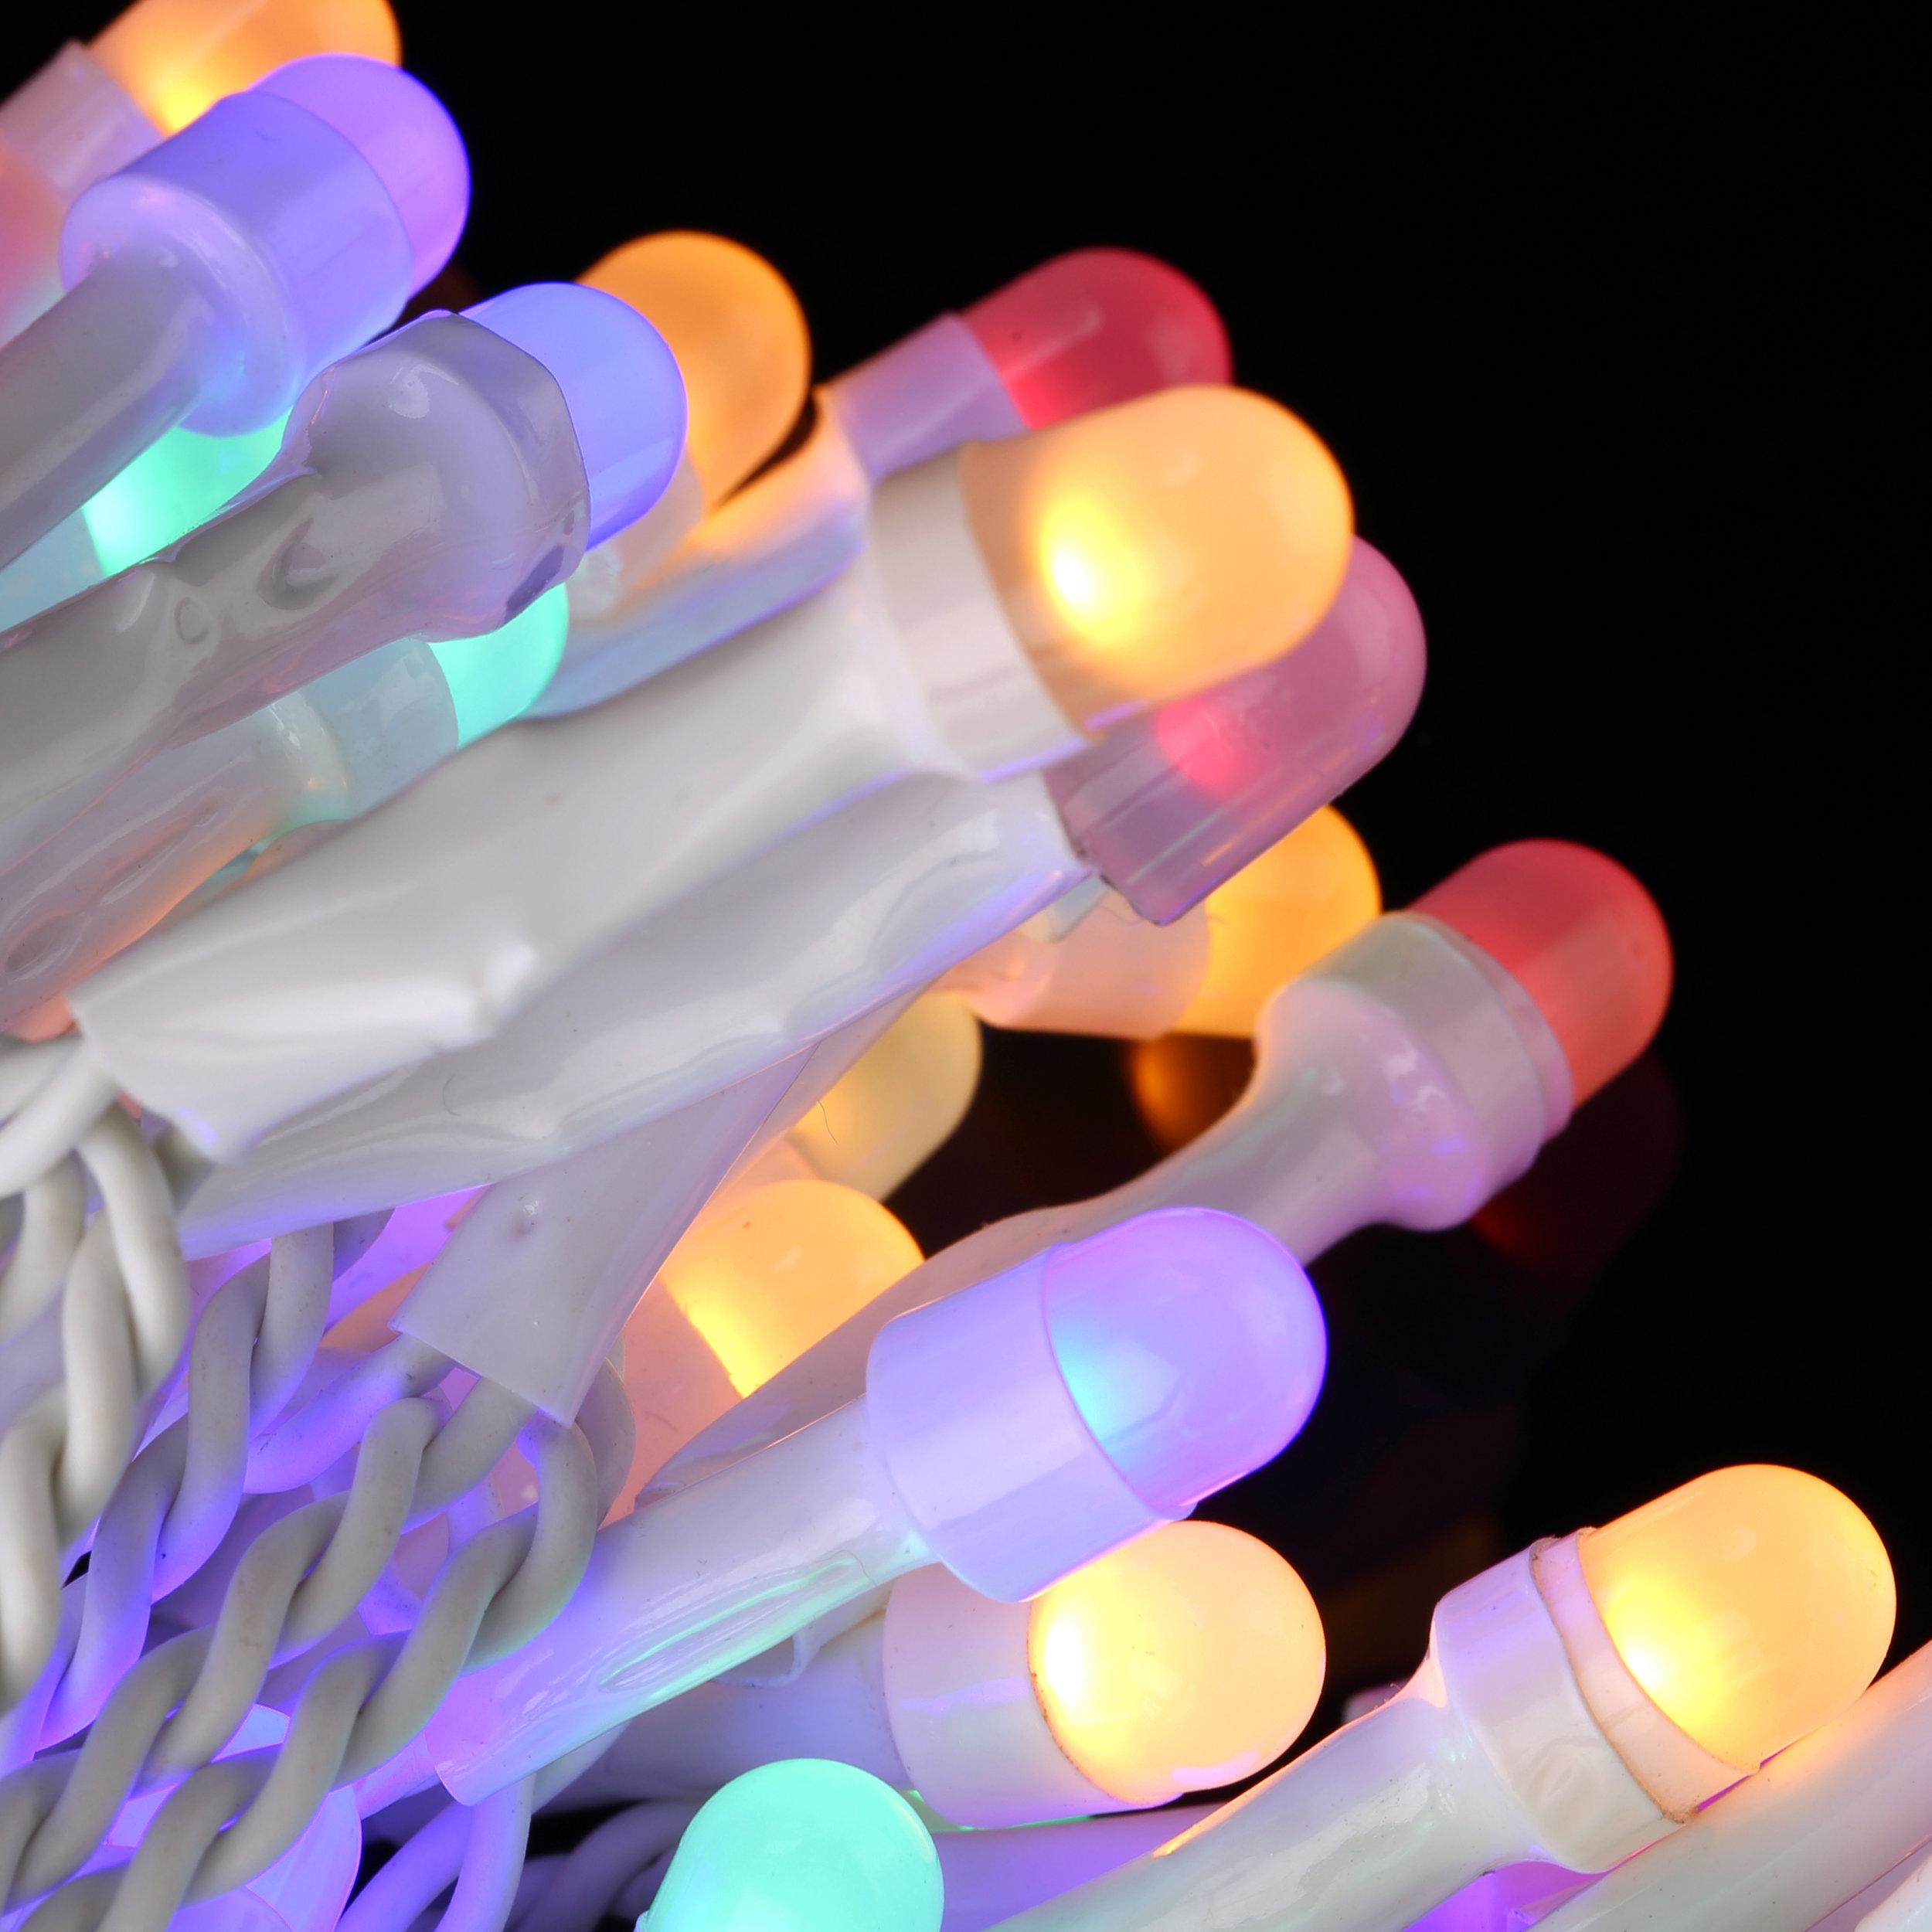 Novolink SL-200-8-BLE-MC group of LEDs